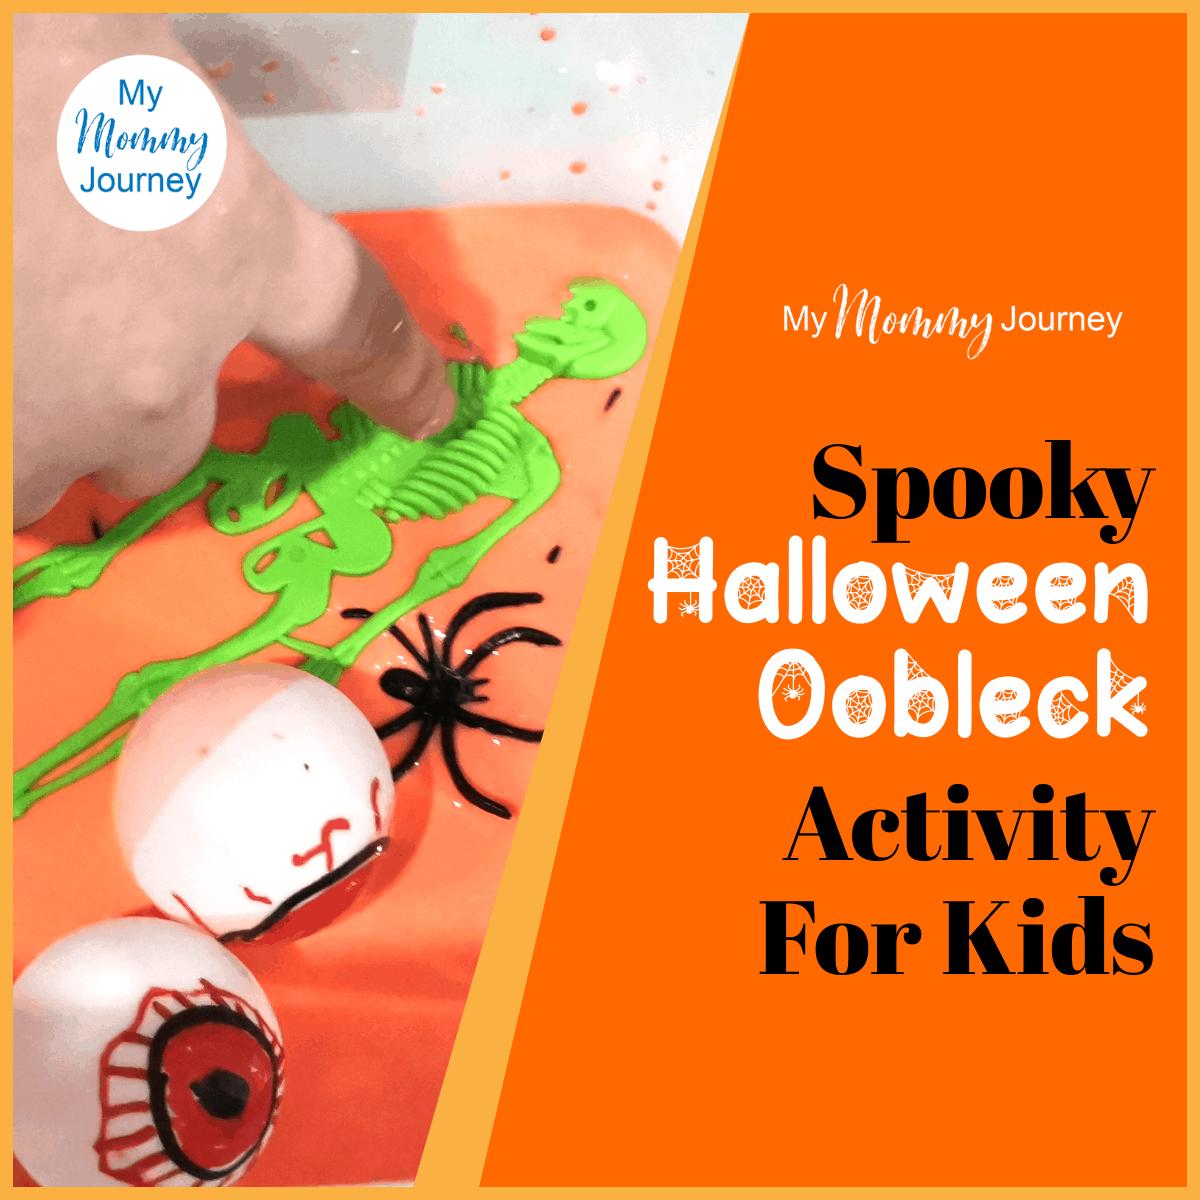 Spooky Halloween Oobleck Activity For Kids